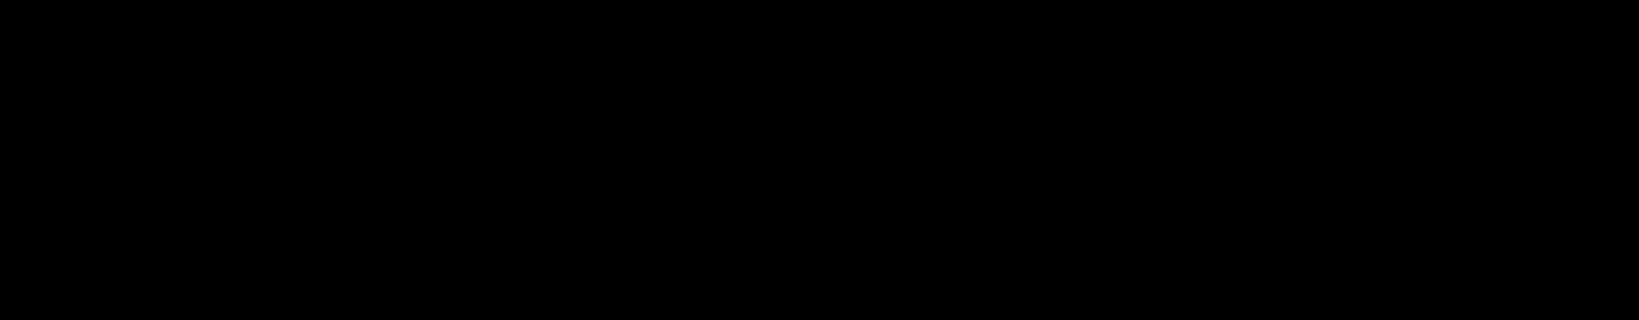 carbon-array-3DDg3WaJxLCe75